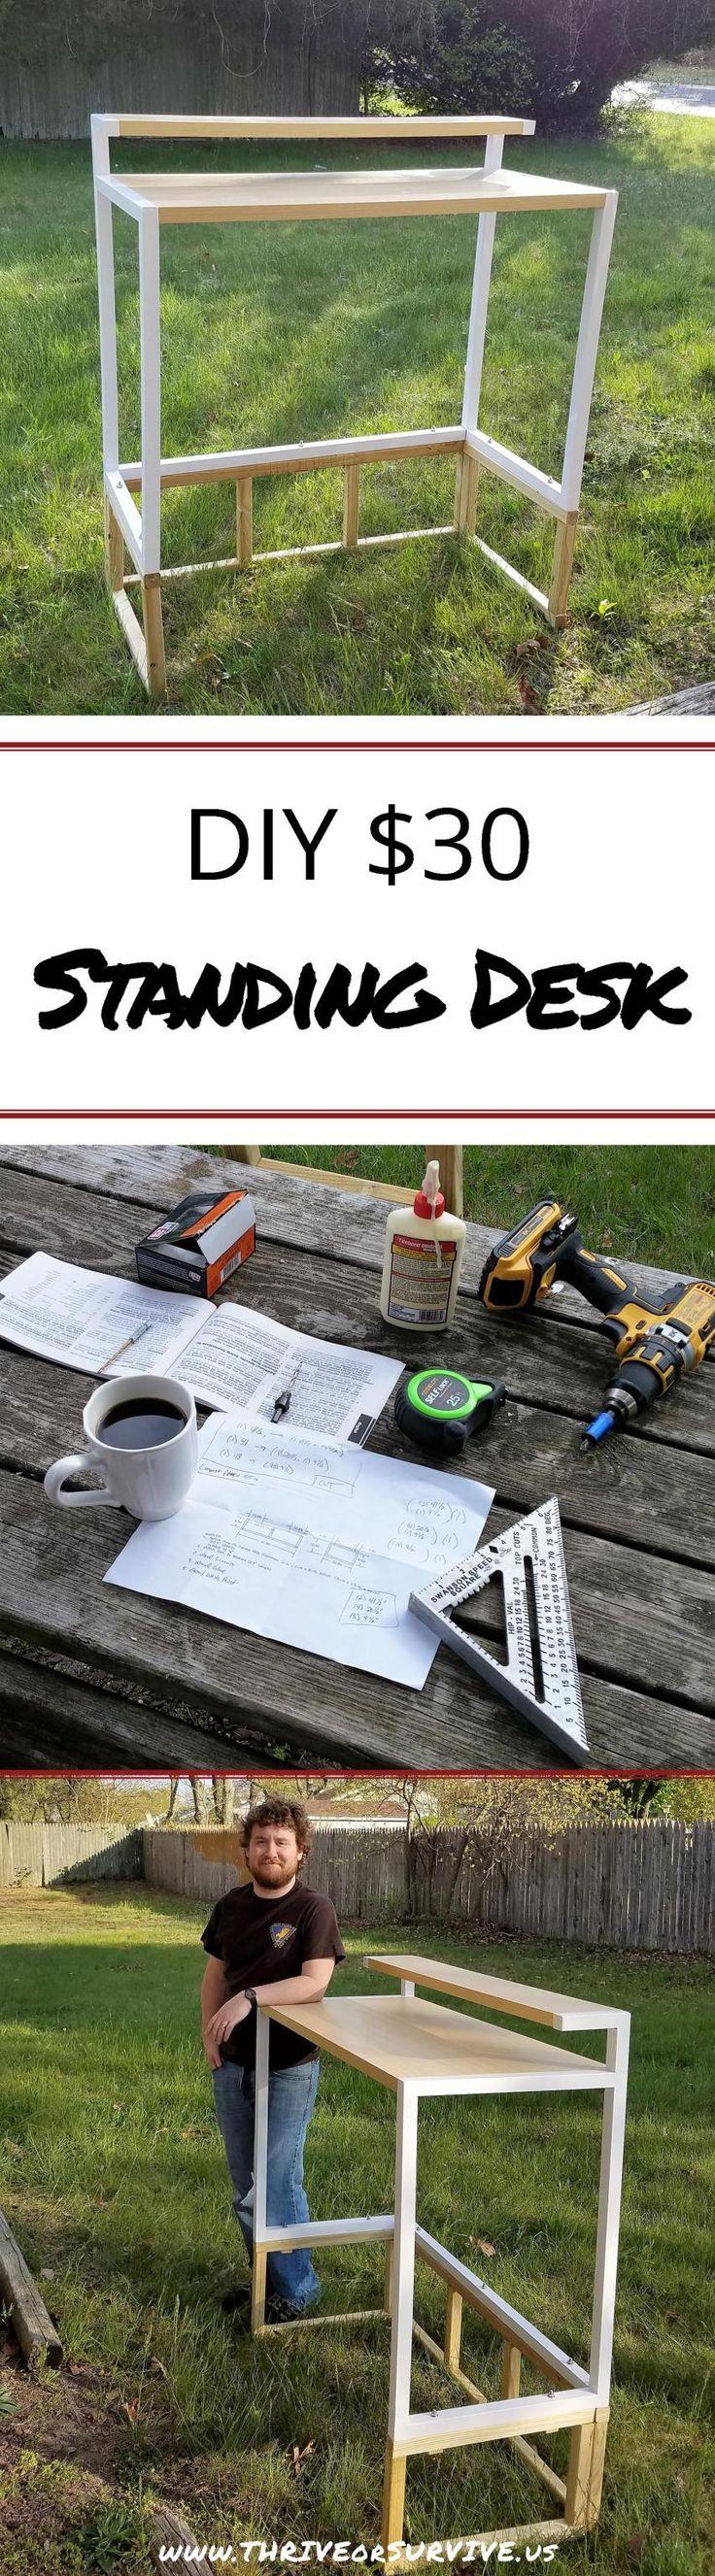 Best 25+ Standing desks ideas on Pinterest | Diy standing desk ...